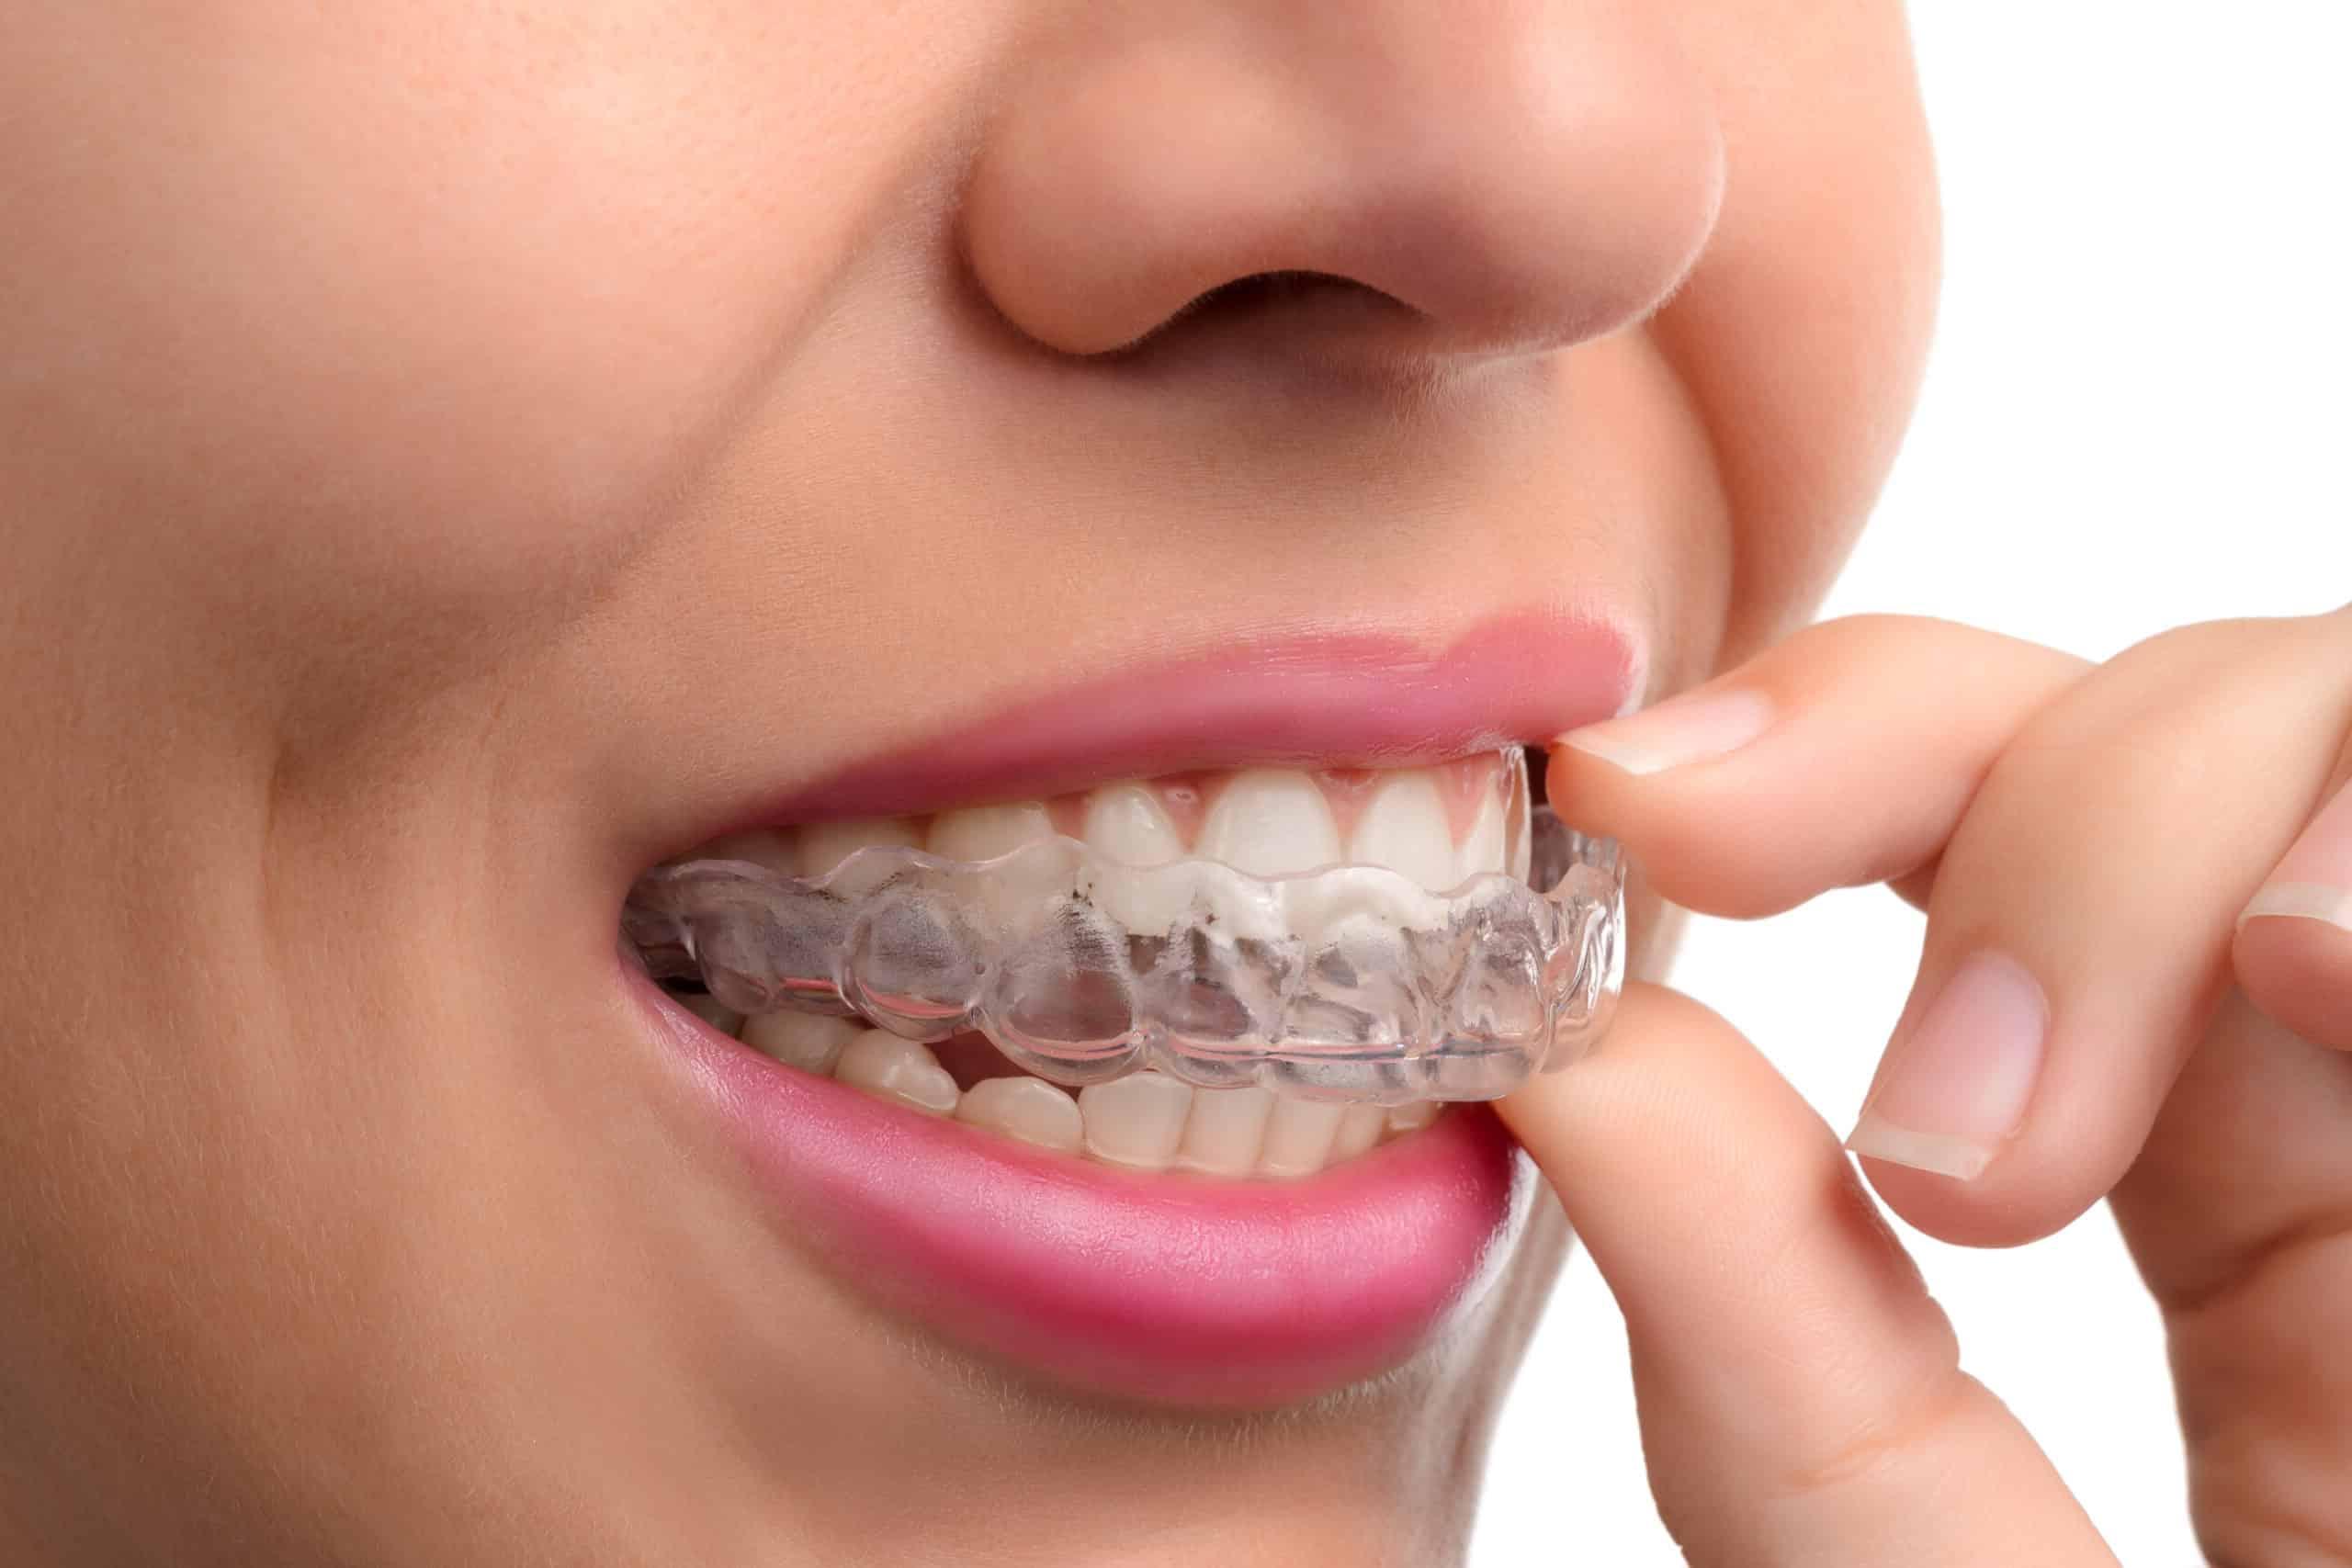 https://dentrum.pl/wp-content/uploads/ortodoncja-3-scaled-e1592448074779.jpg